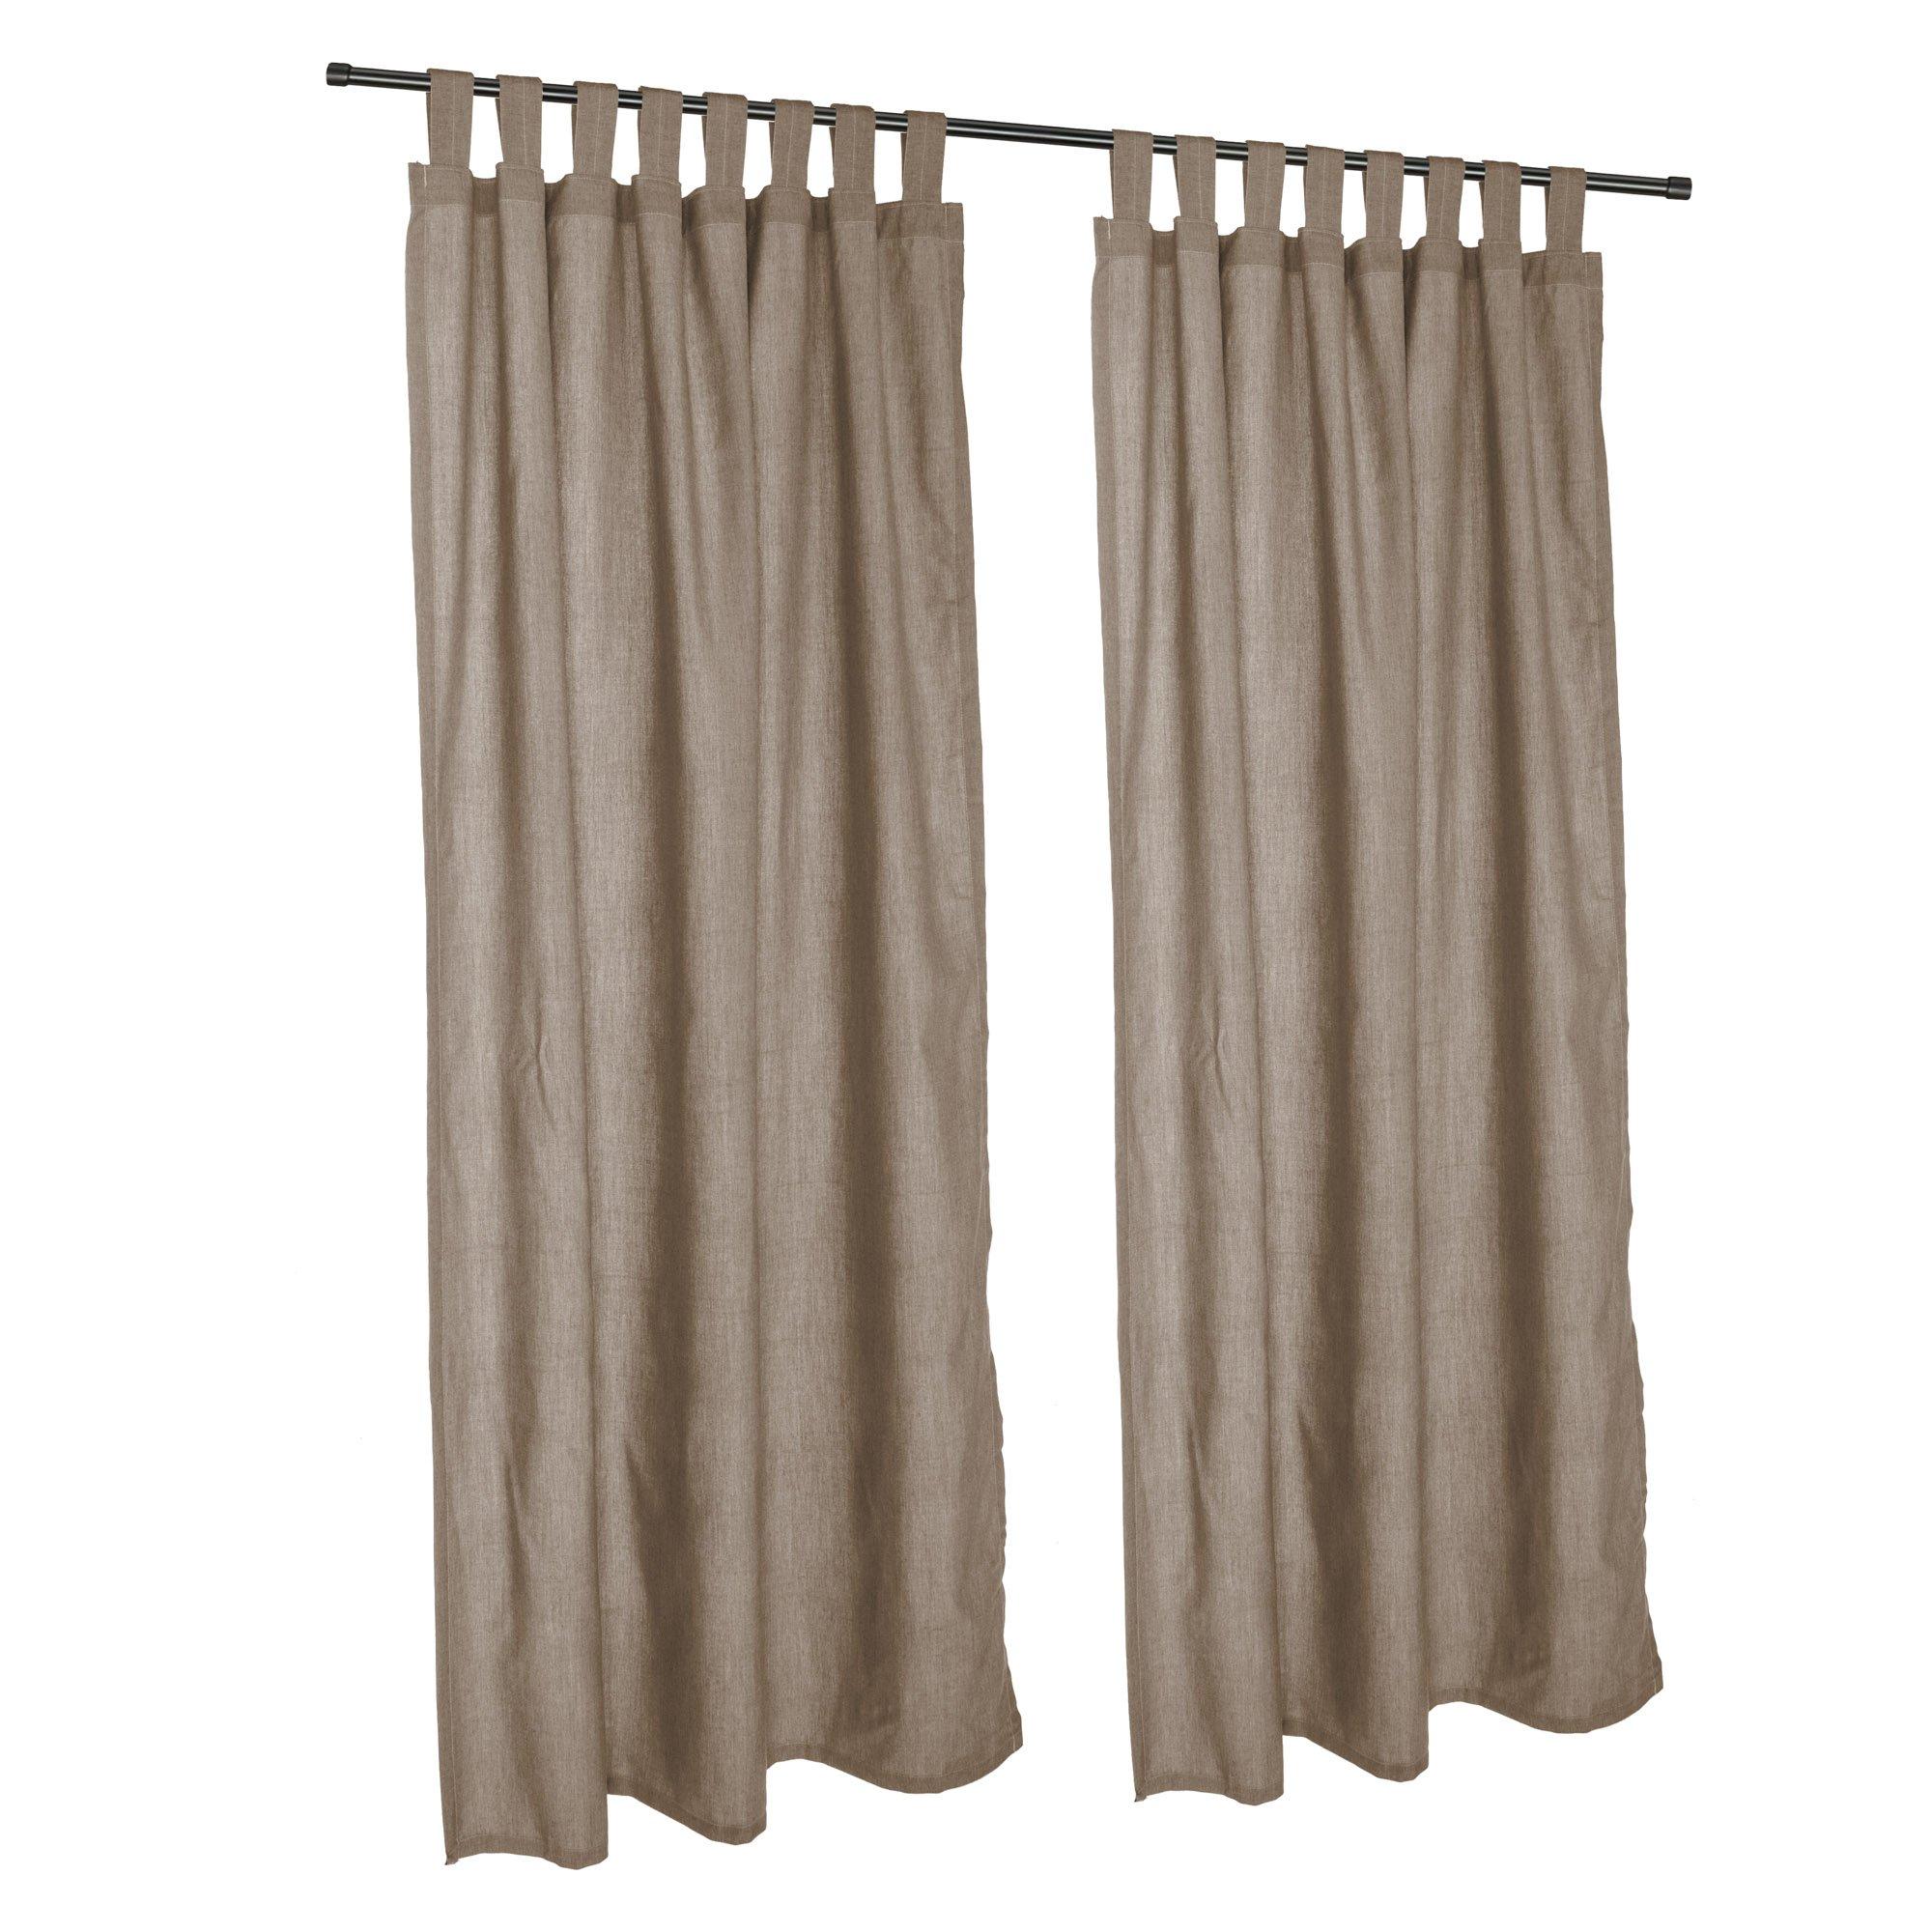 Pawleys Island Sunbrella Outdoor Gazebo Tabbed Solid Curtain Panel Cast Shale 50'' x 120''